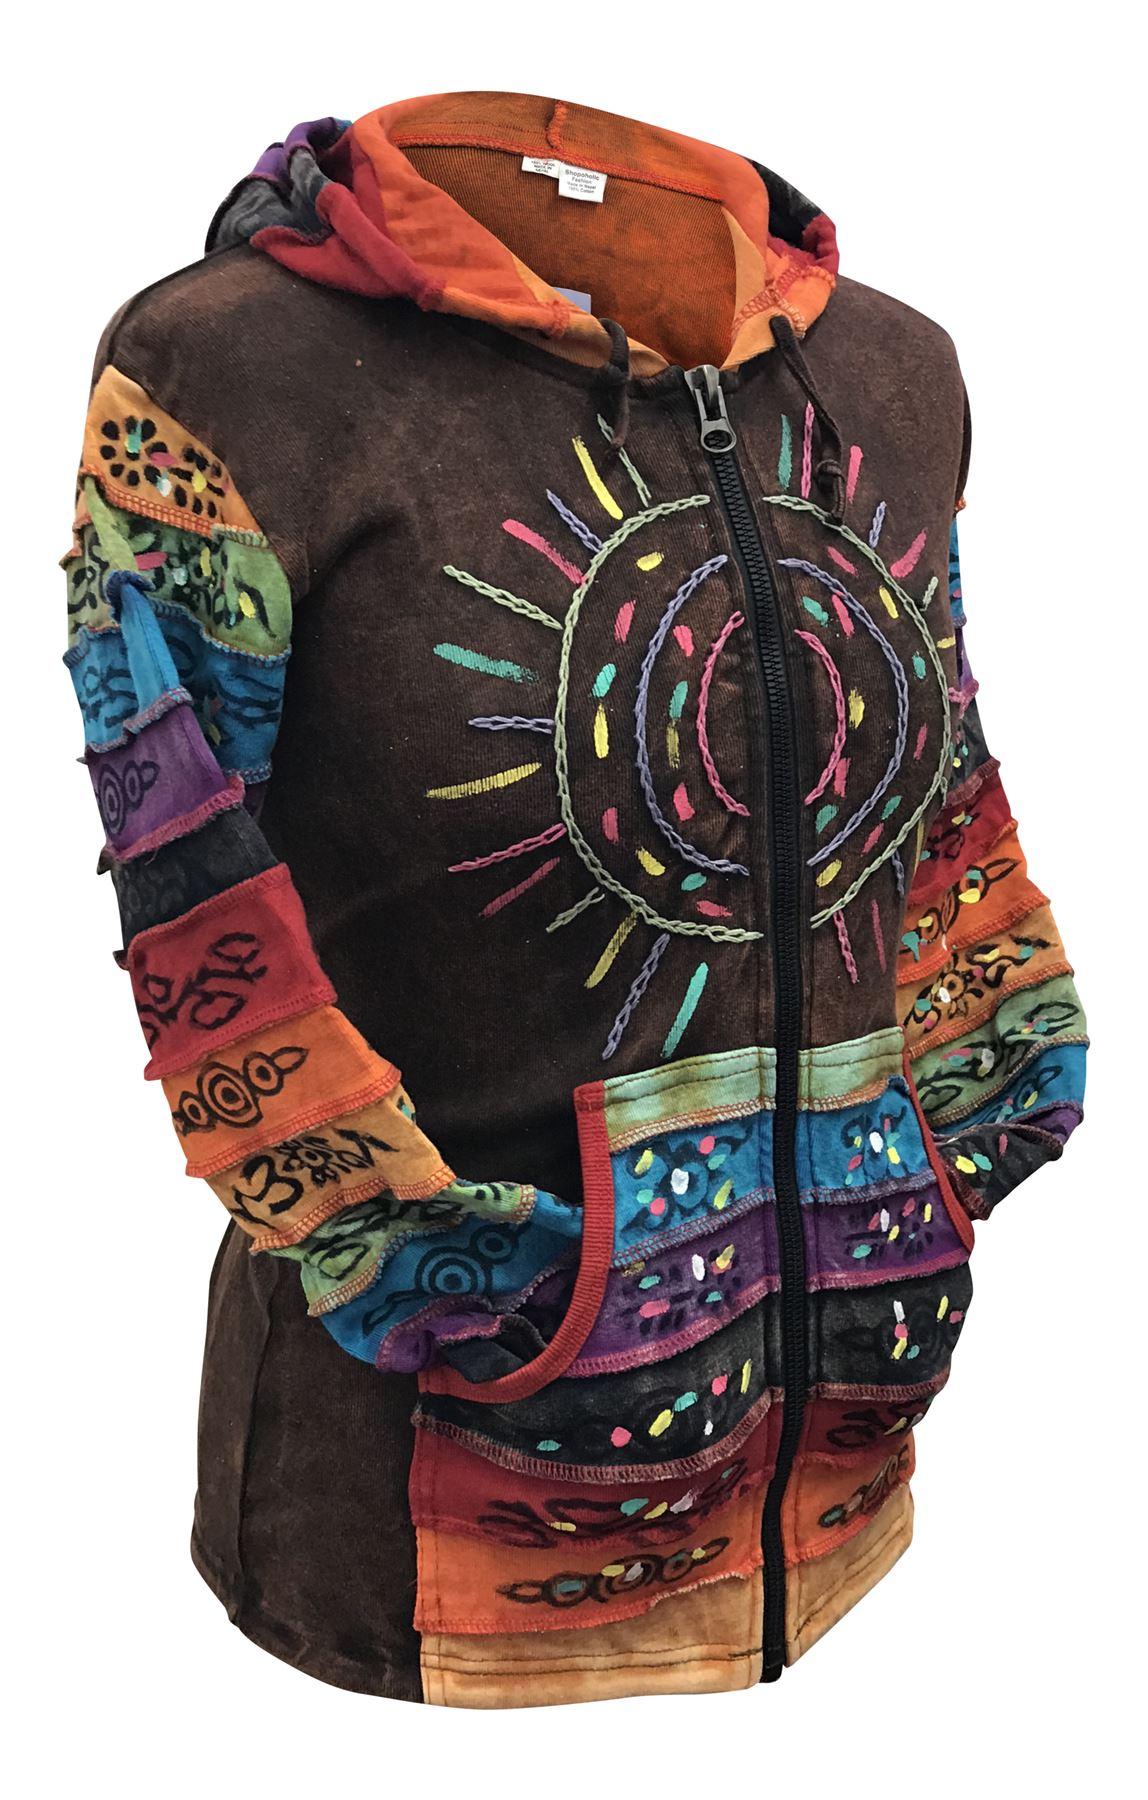 Women-039-s-Sun-Patchwork-Pixie-Hippy-Ribs-Hoodie-Light-Cotton-Hippie-Faded-Jacket thumbnail 6